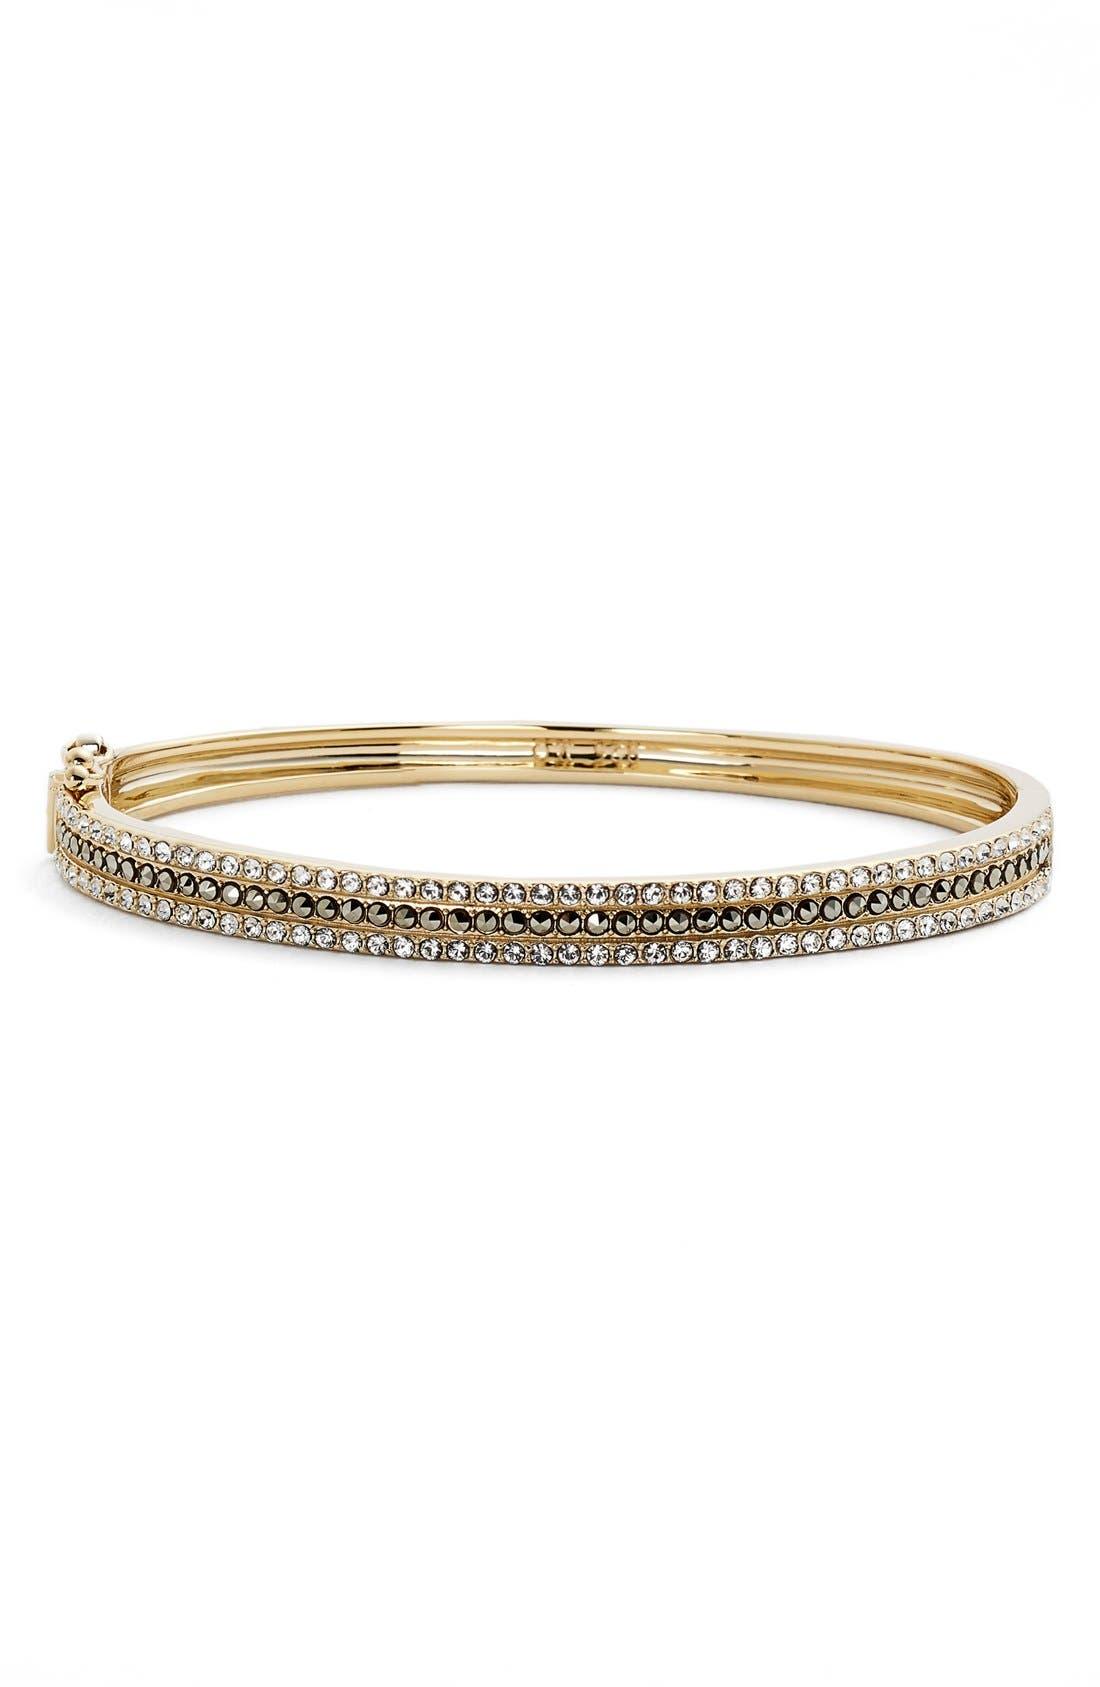 Three Row Bangle Bracelet,                         Main,                         color, Gold